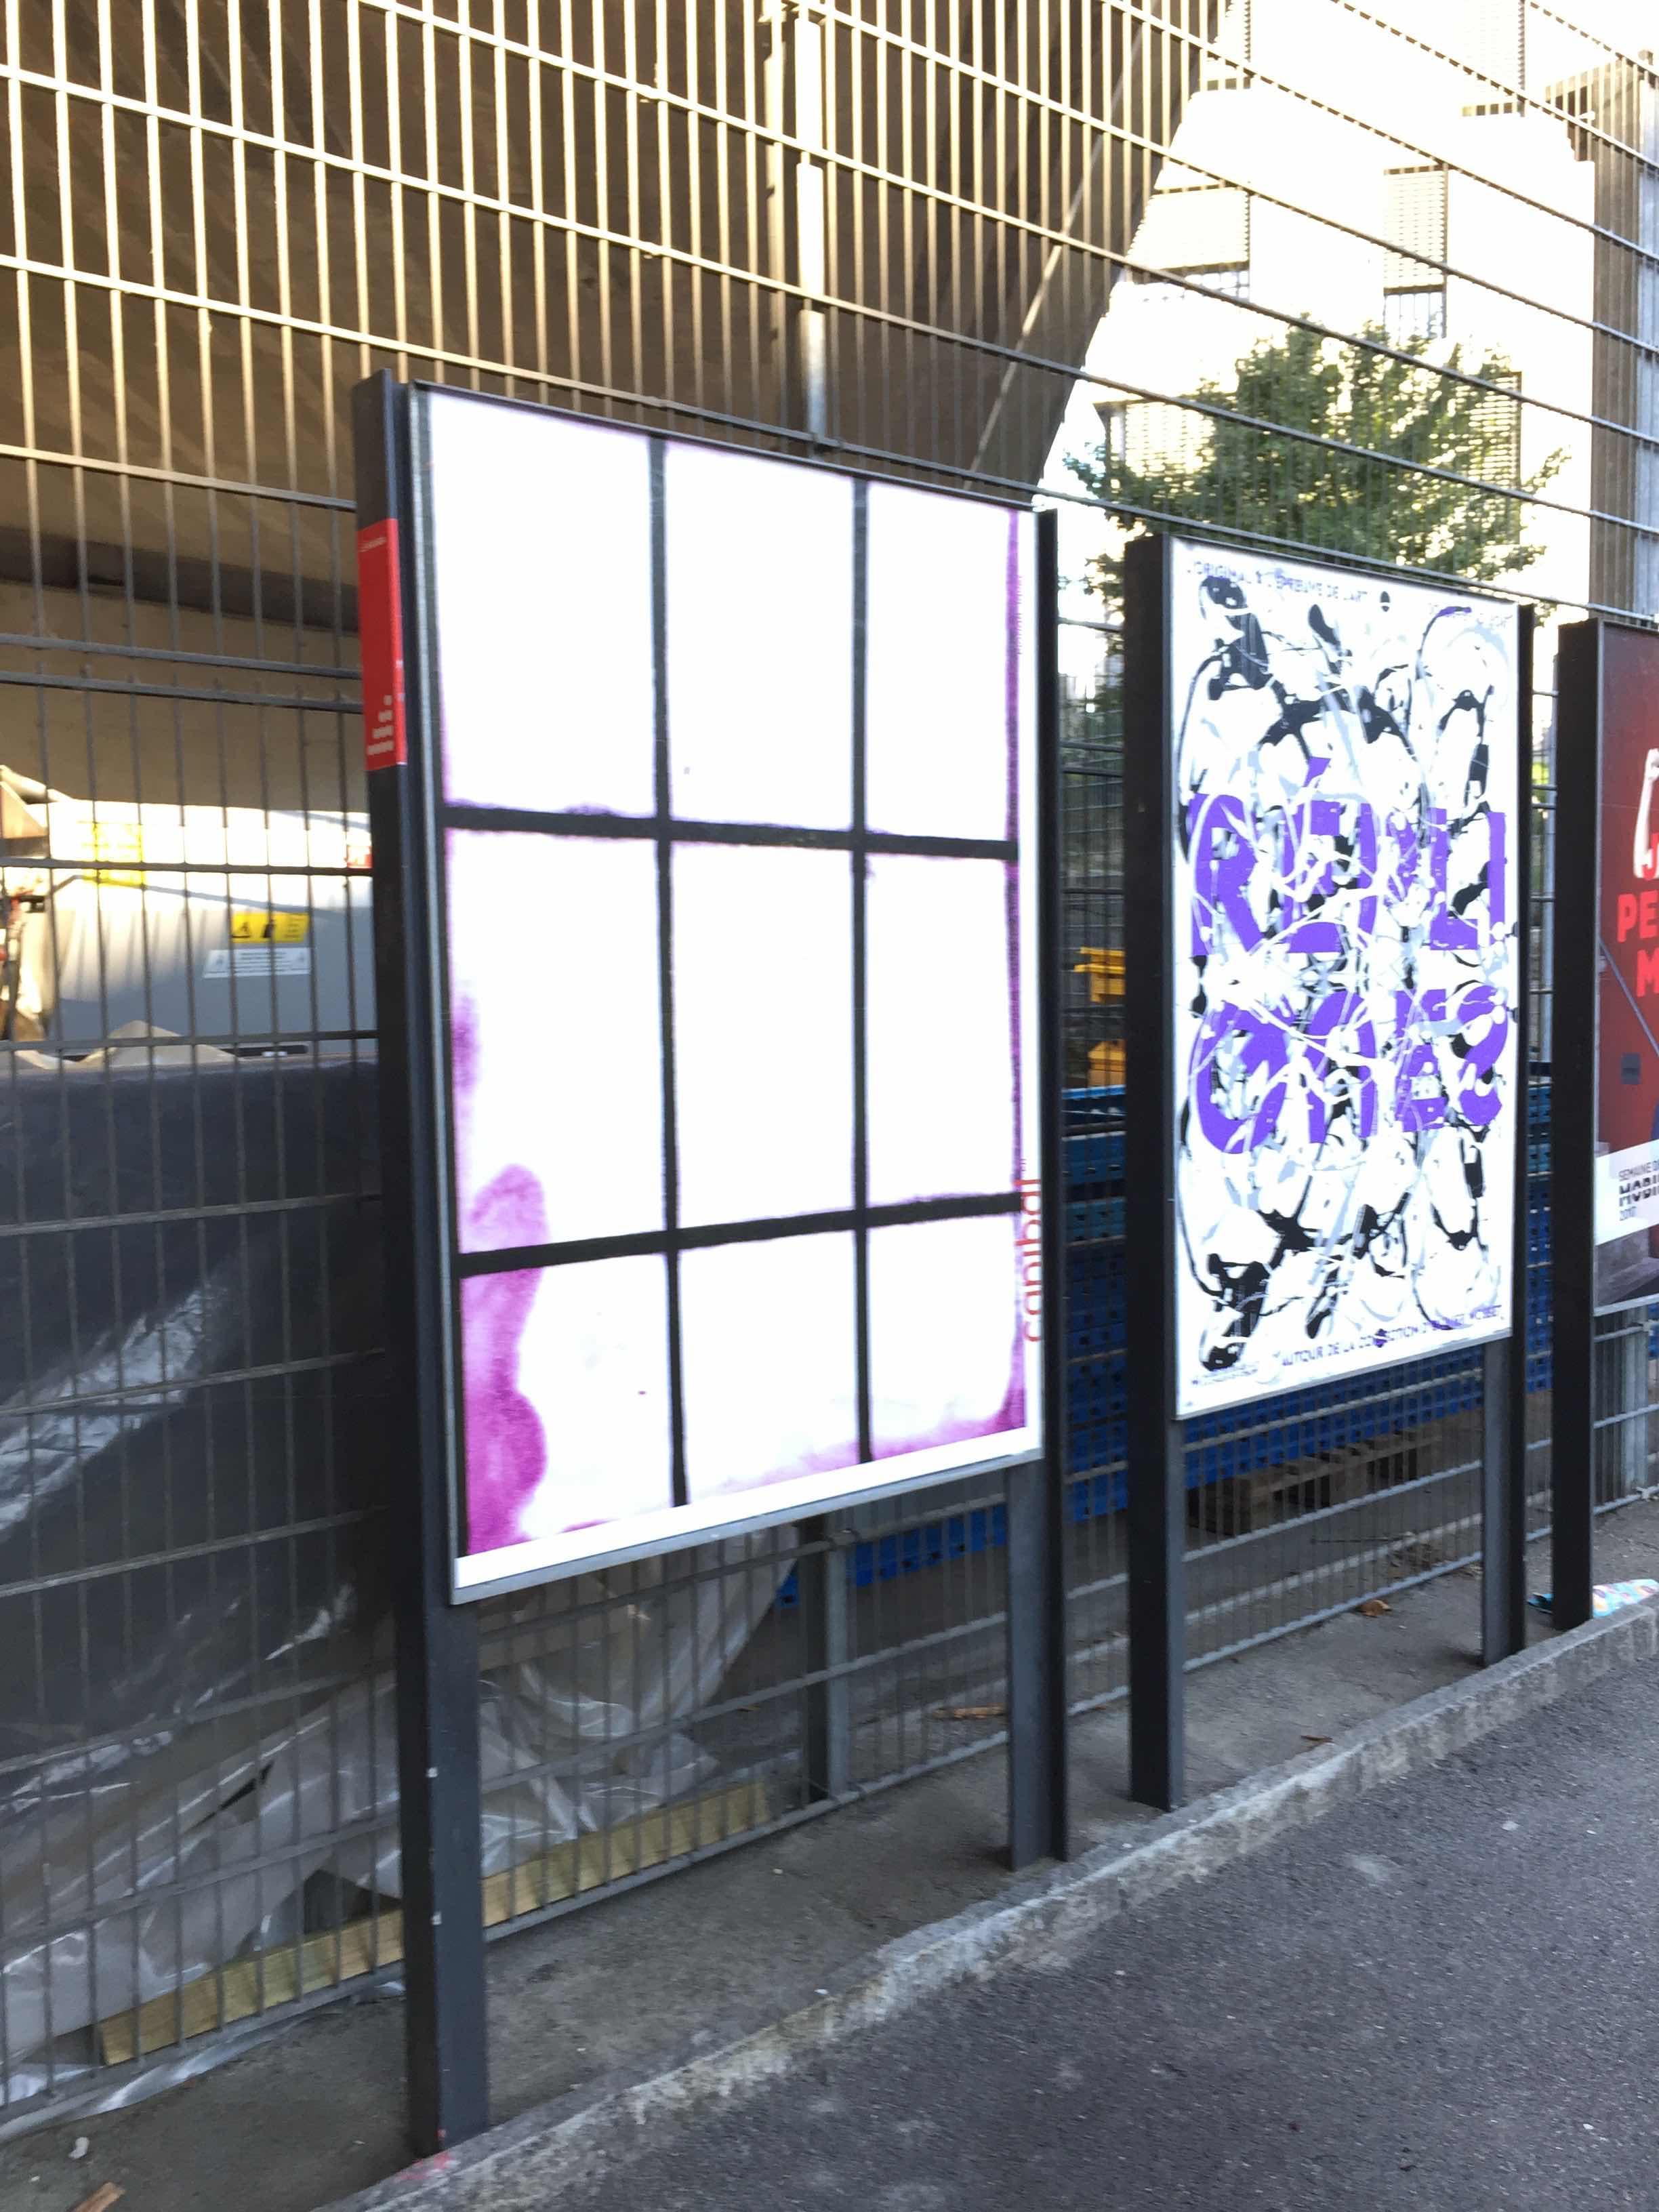 Florian Javet, chemin de malley 55, Lausanne-IMG_5906